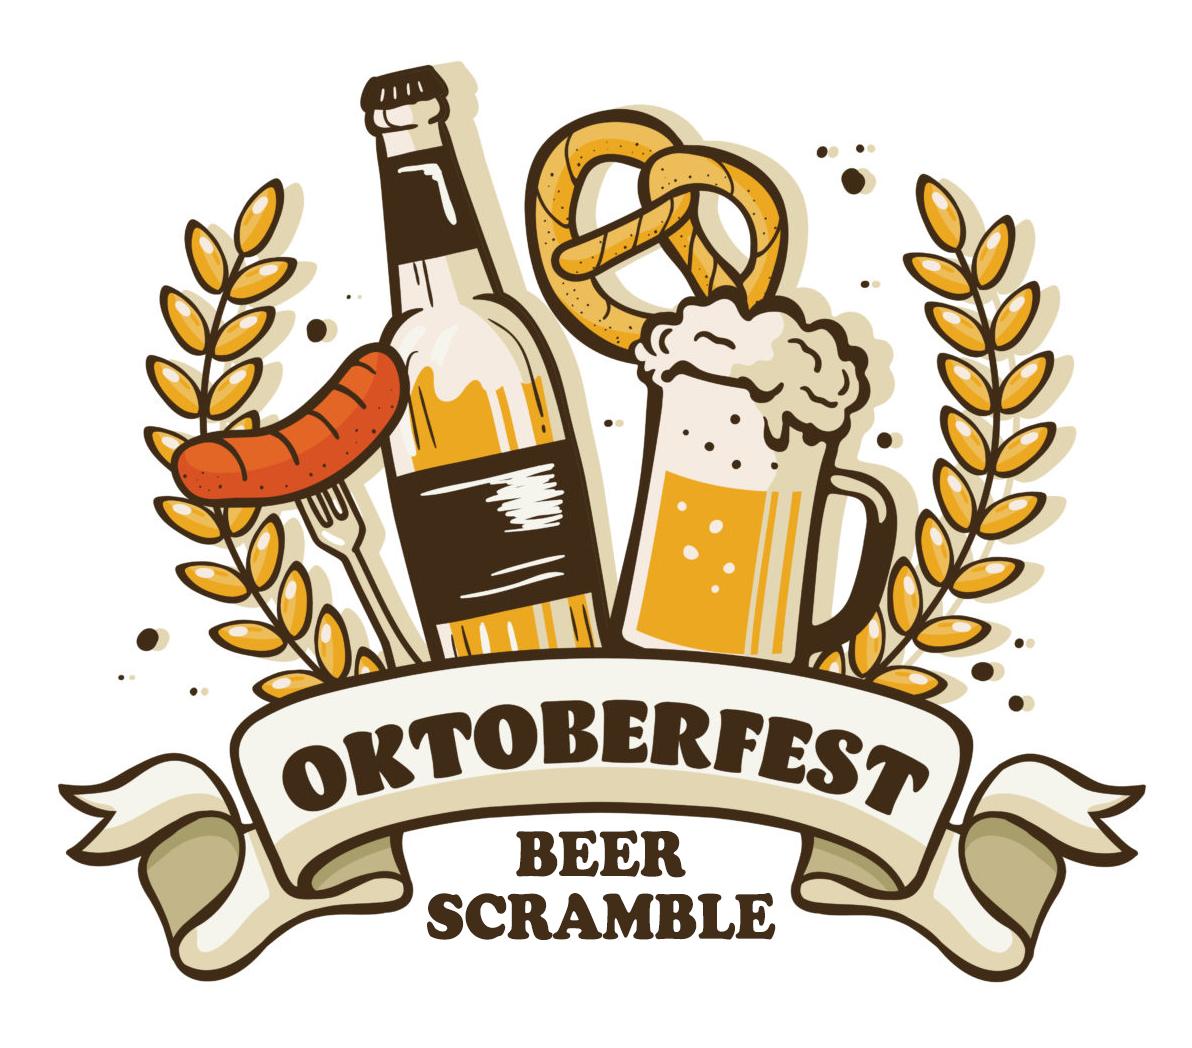 oktoberfest-beer-scramble-02.jpg